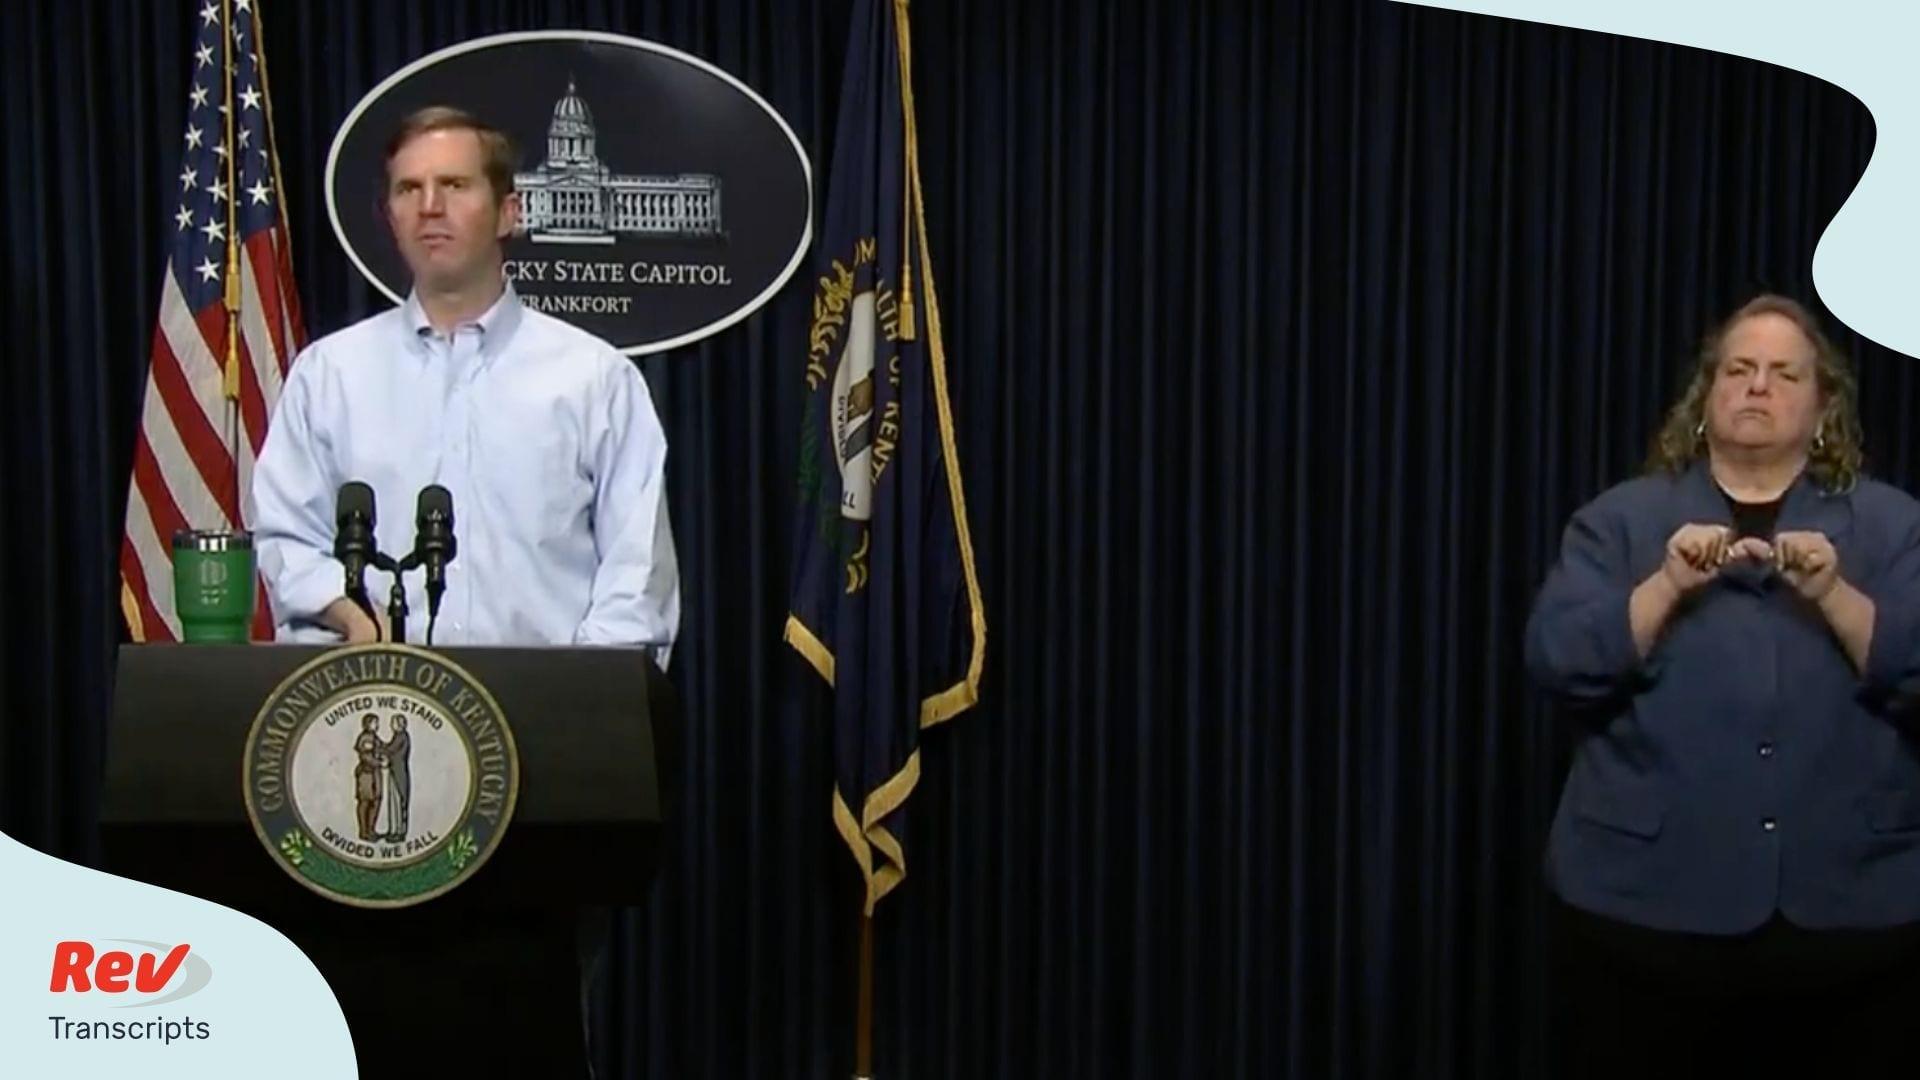 Kentucky Governor April 8 Briefing